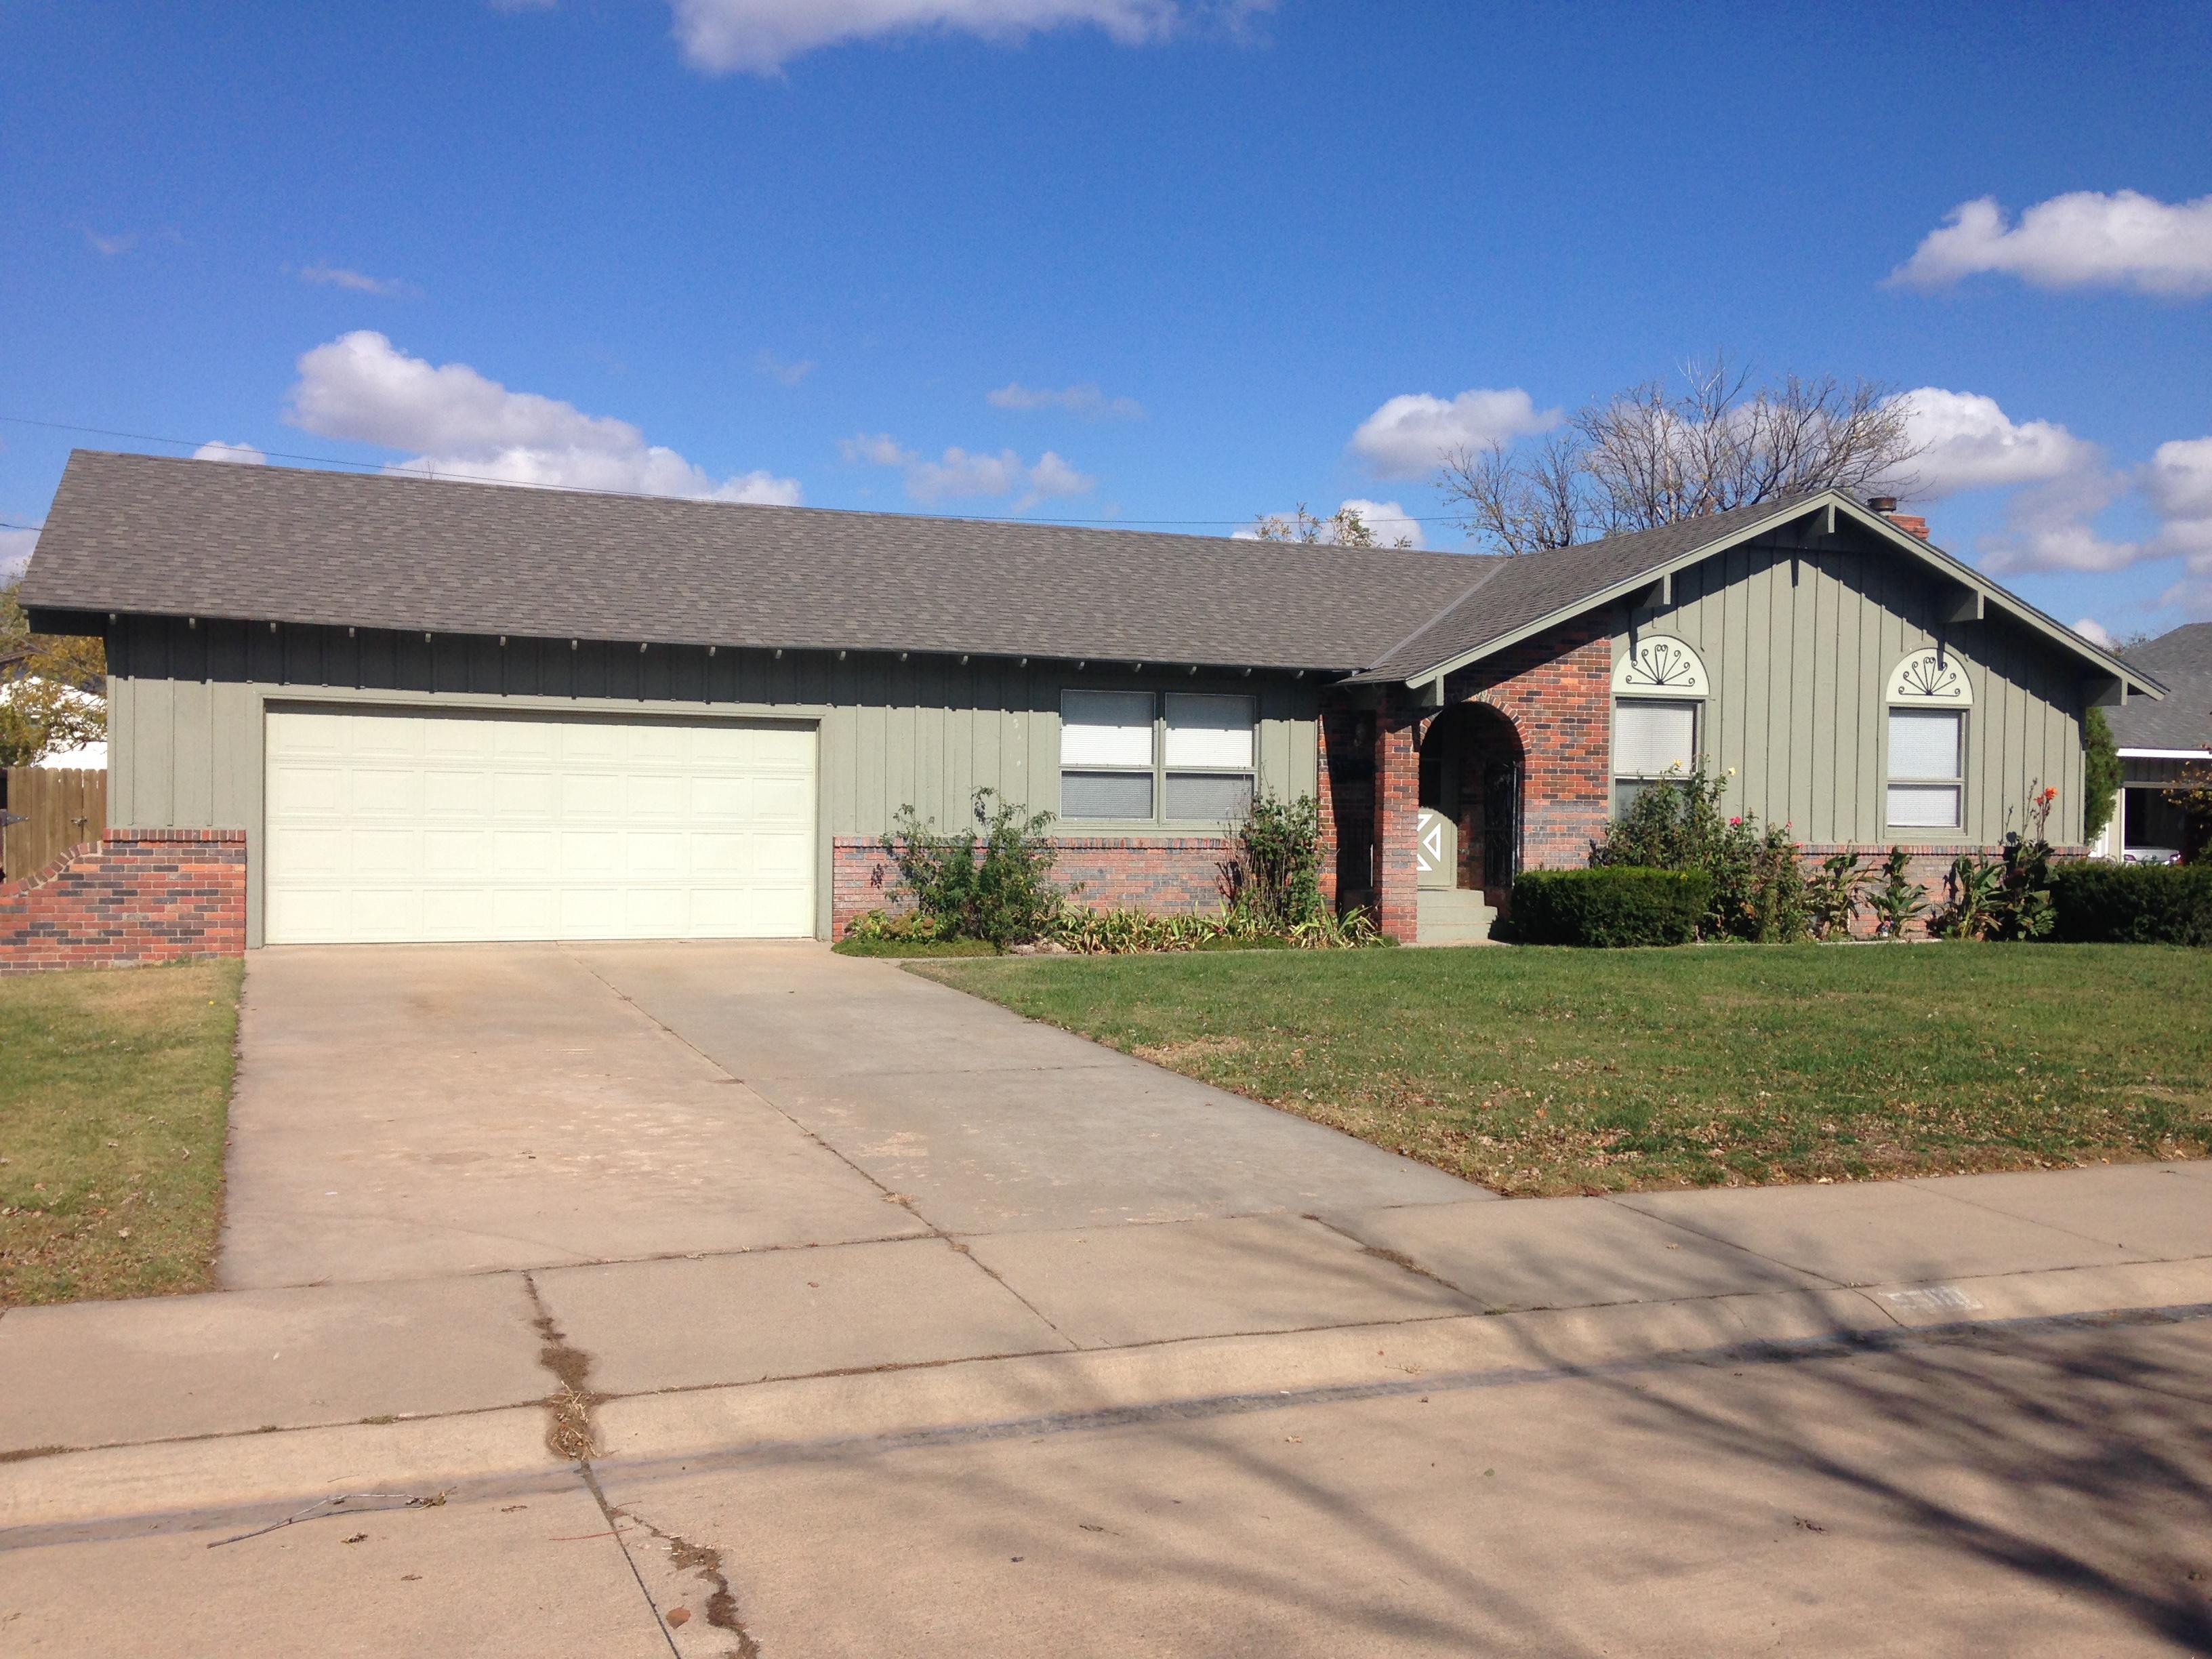 5500 Comanche Rd, Great Bend, Kansas 67530